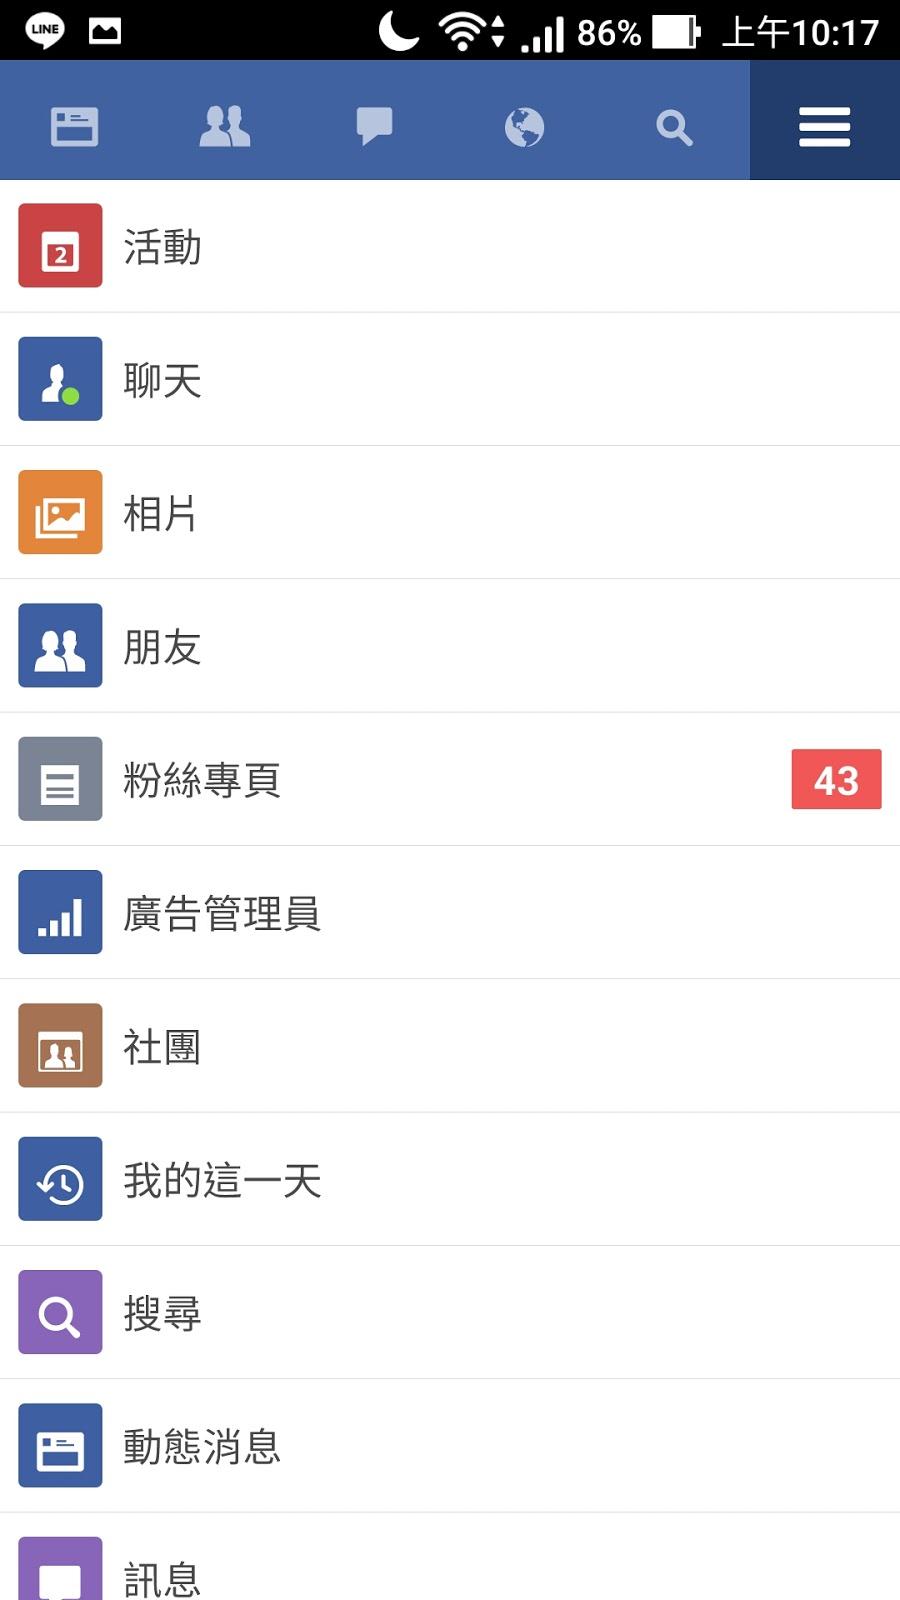 Screenshot 20170603 101712 - Facebook Lite - 官方推出的輕量版臉書App,超省流量及系統資源、把你用不到的功能給去掉!